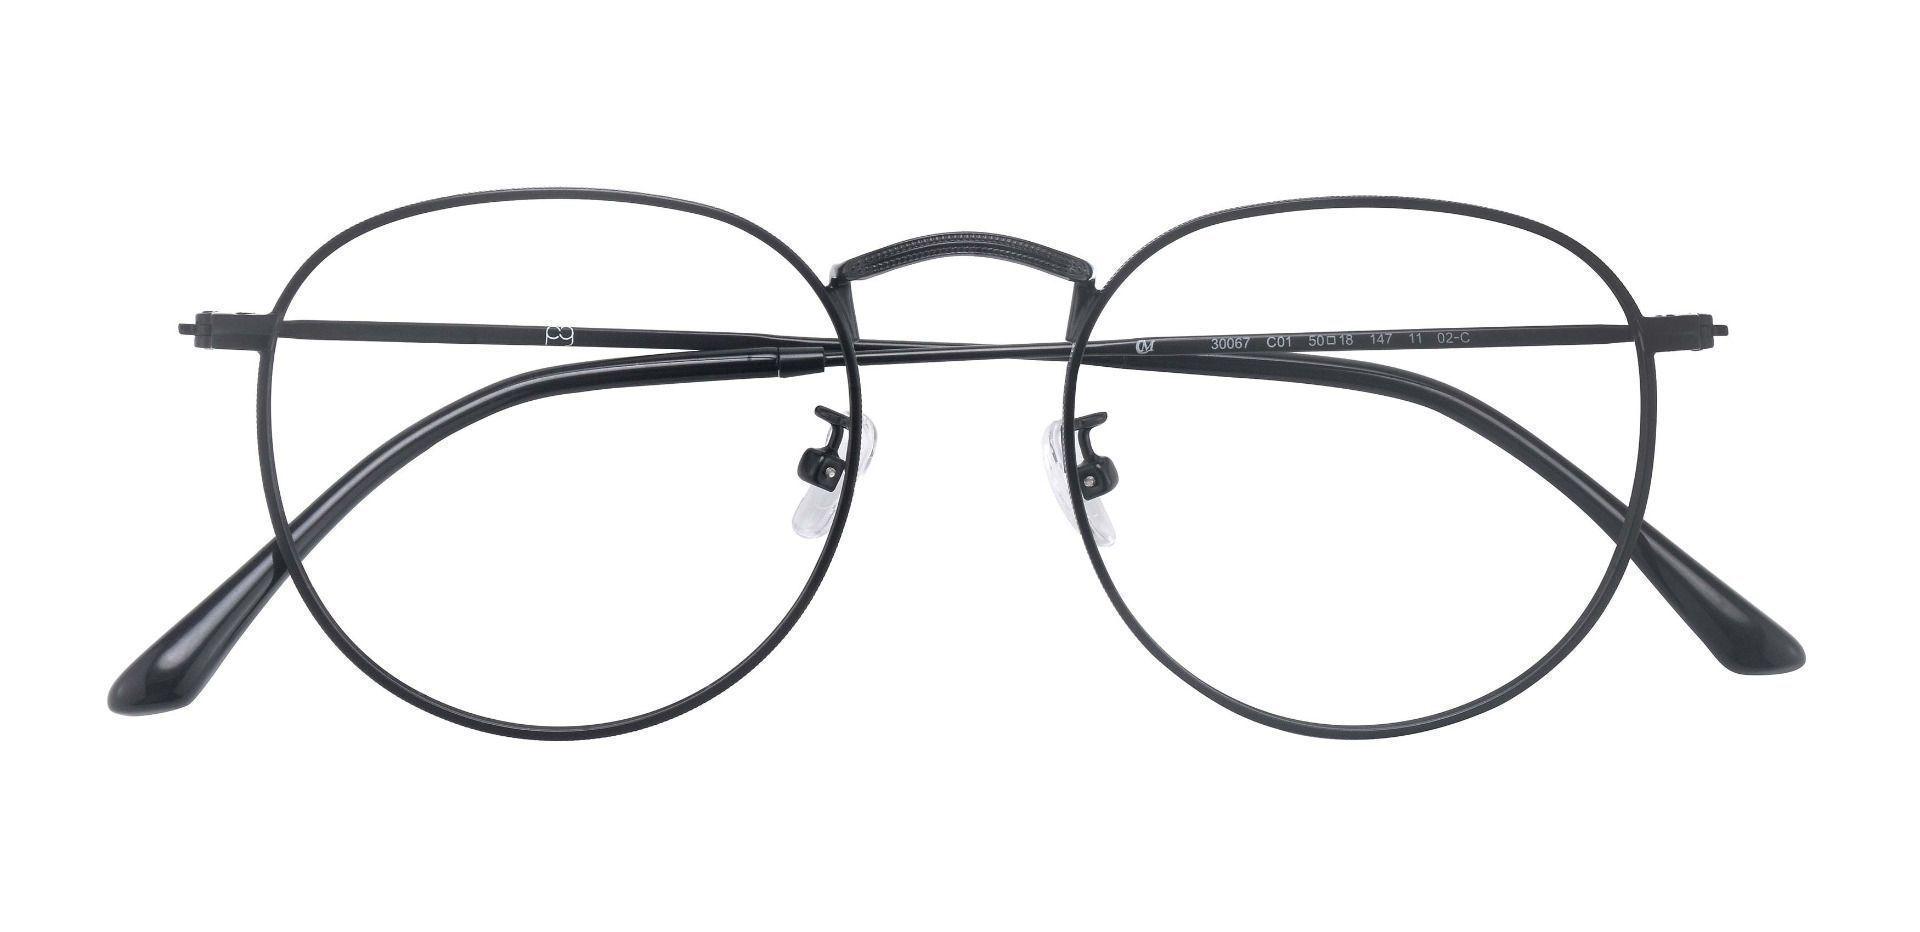 Alden Oval Prescription Glasses - Black